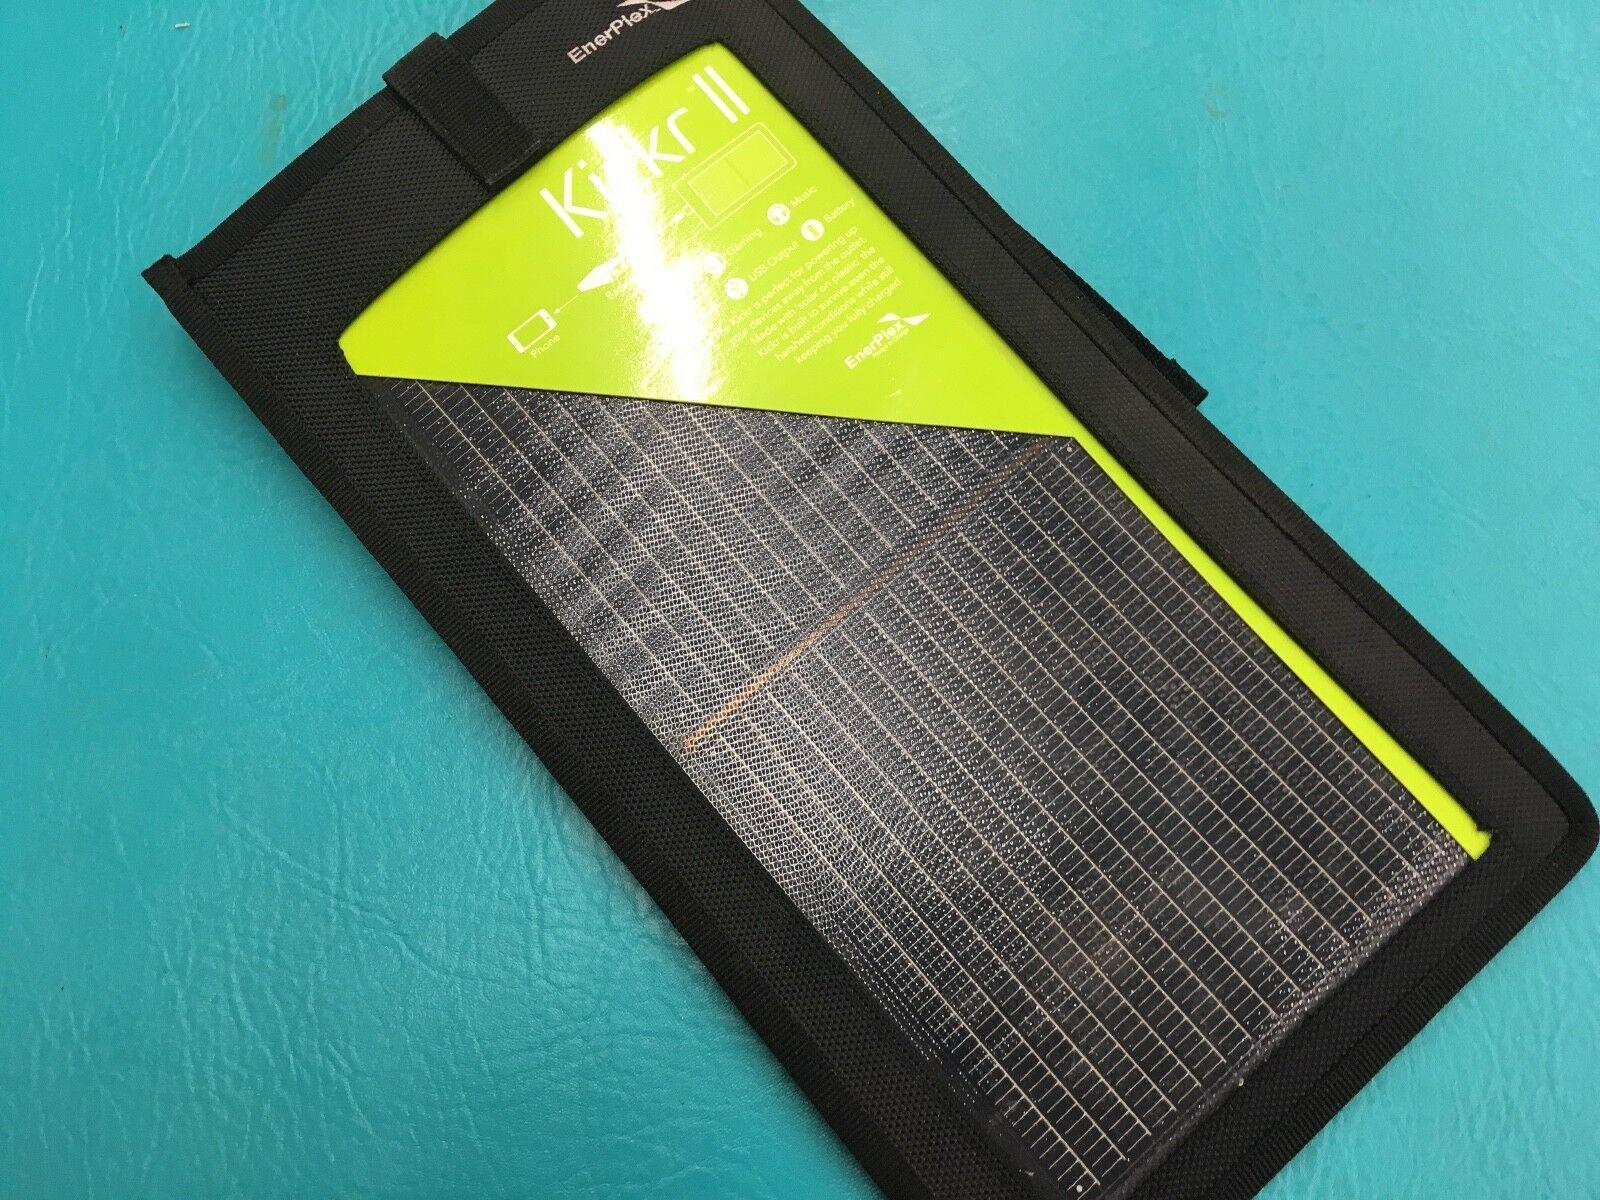 EnerPlex KR-0002-BK Kickr II Portable Solar Charger for Smar